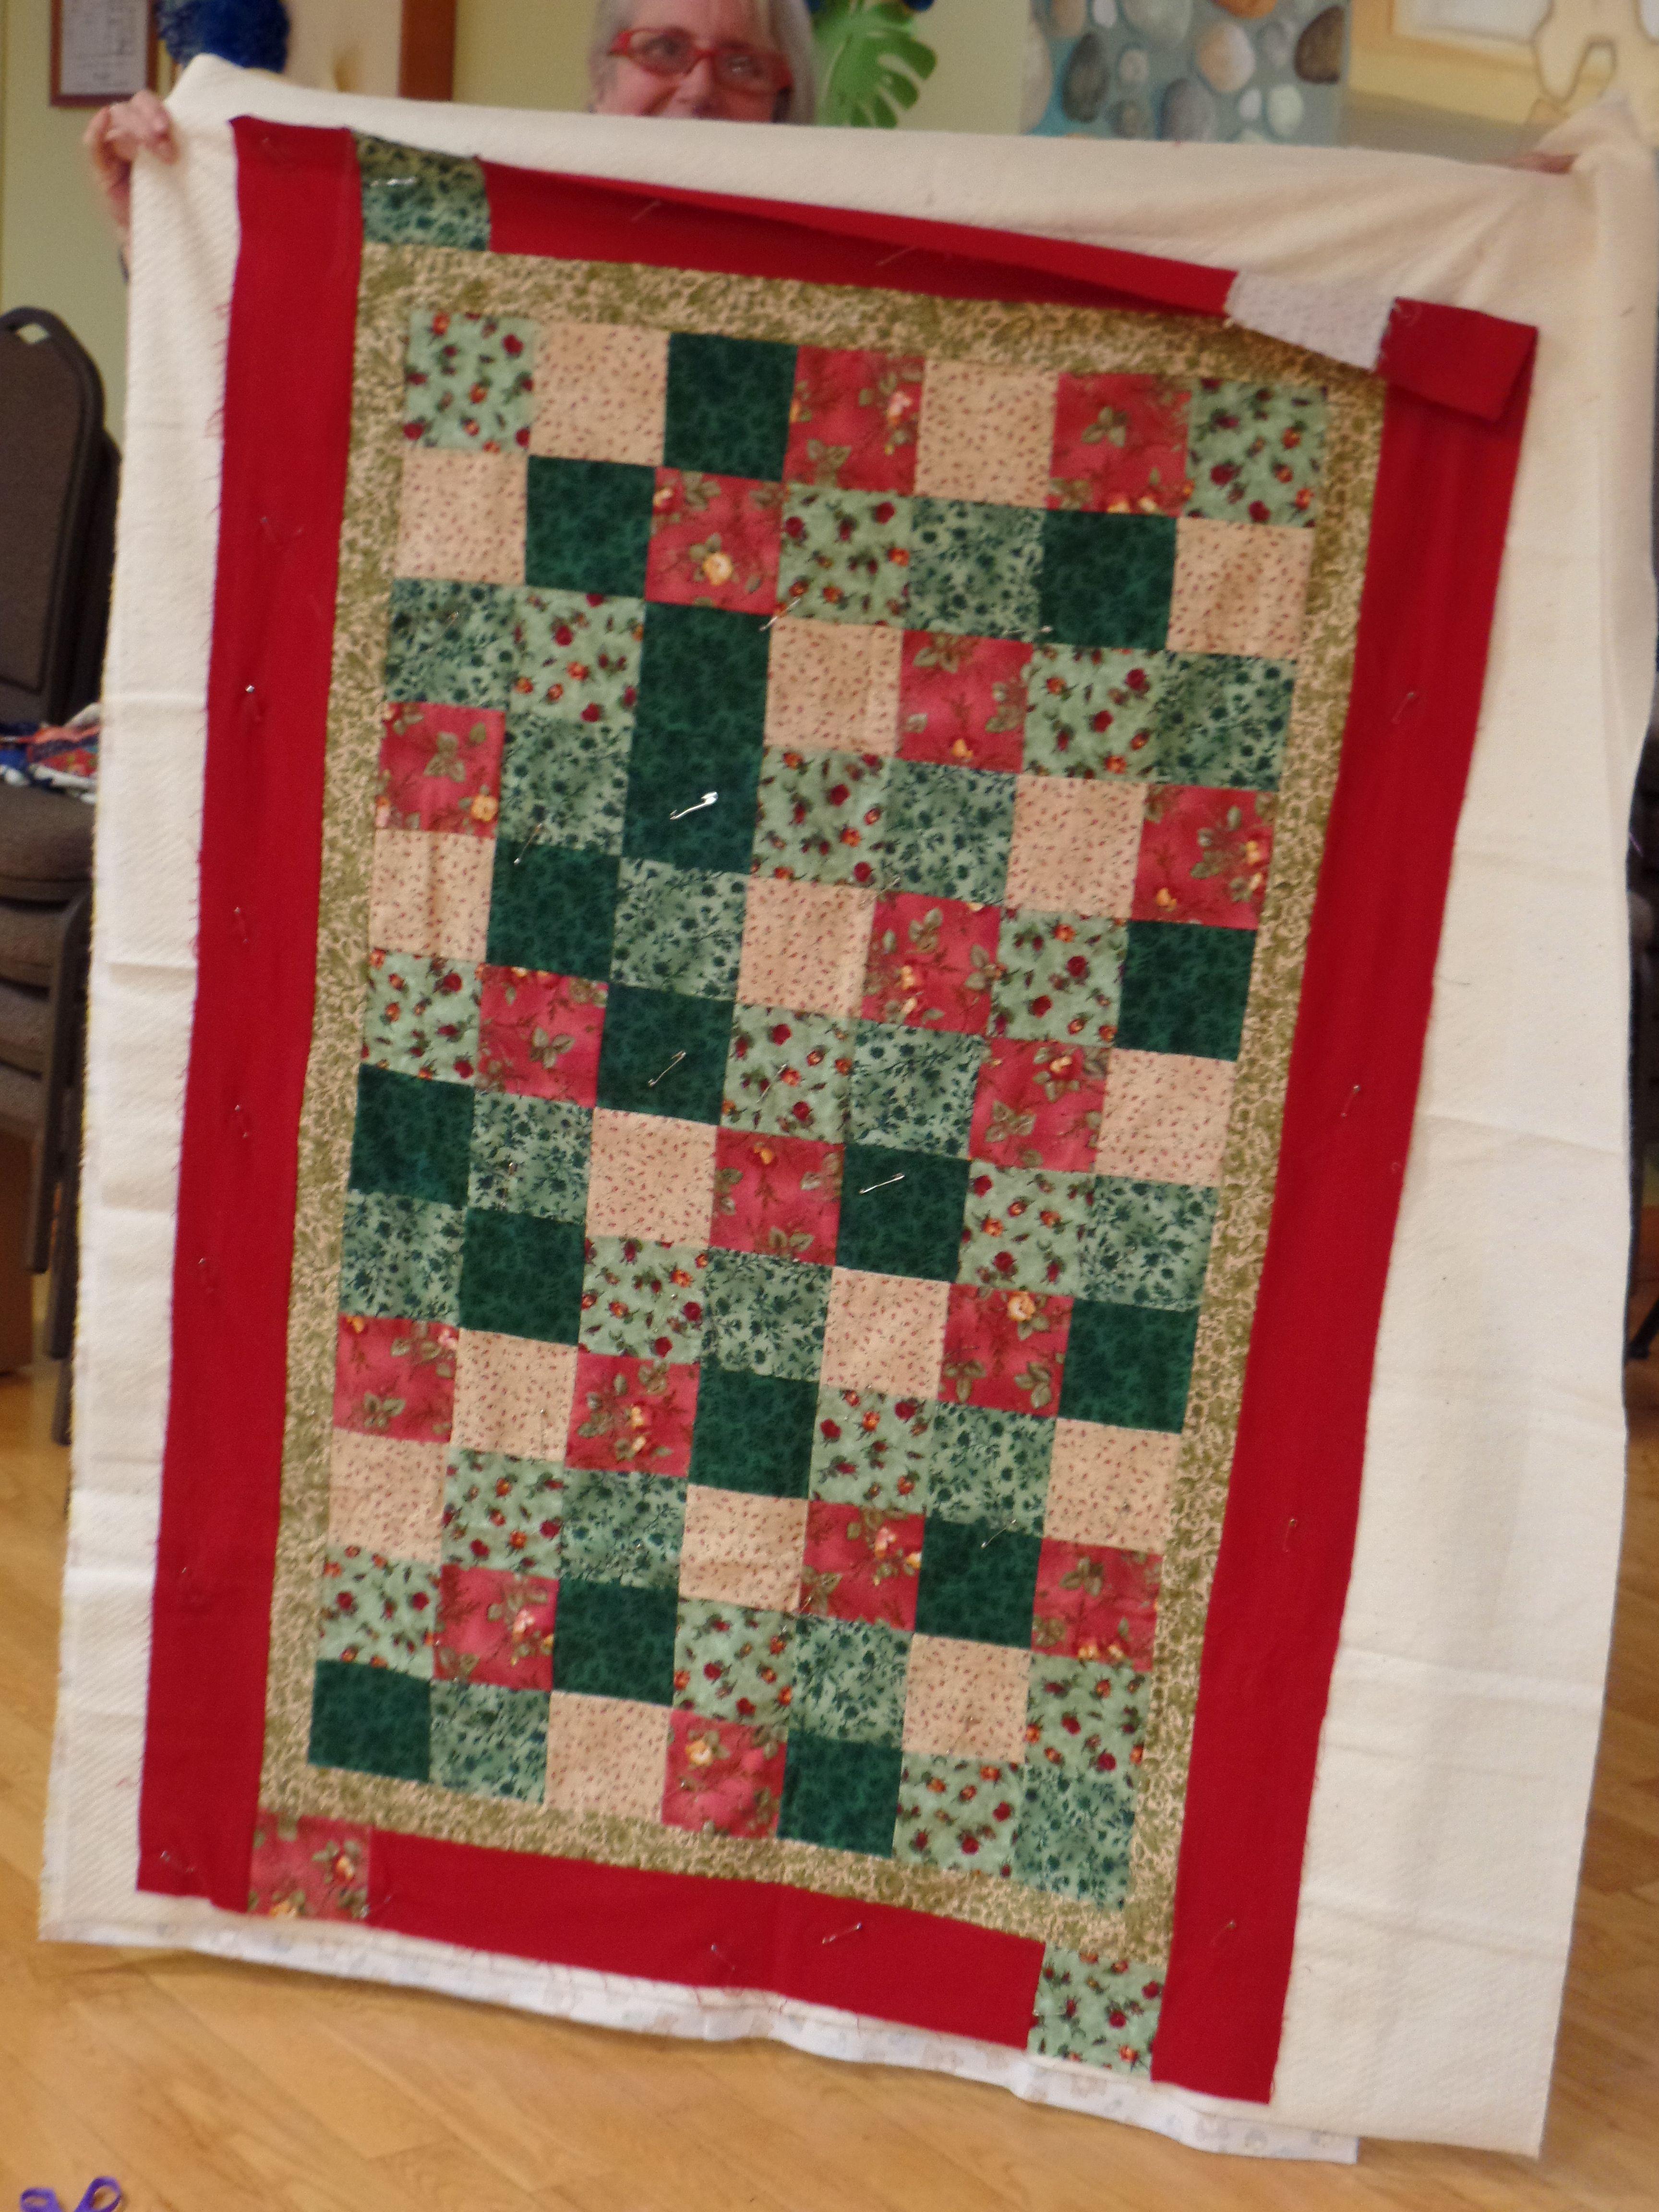 Claudia E. shared her scrap block quilt.